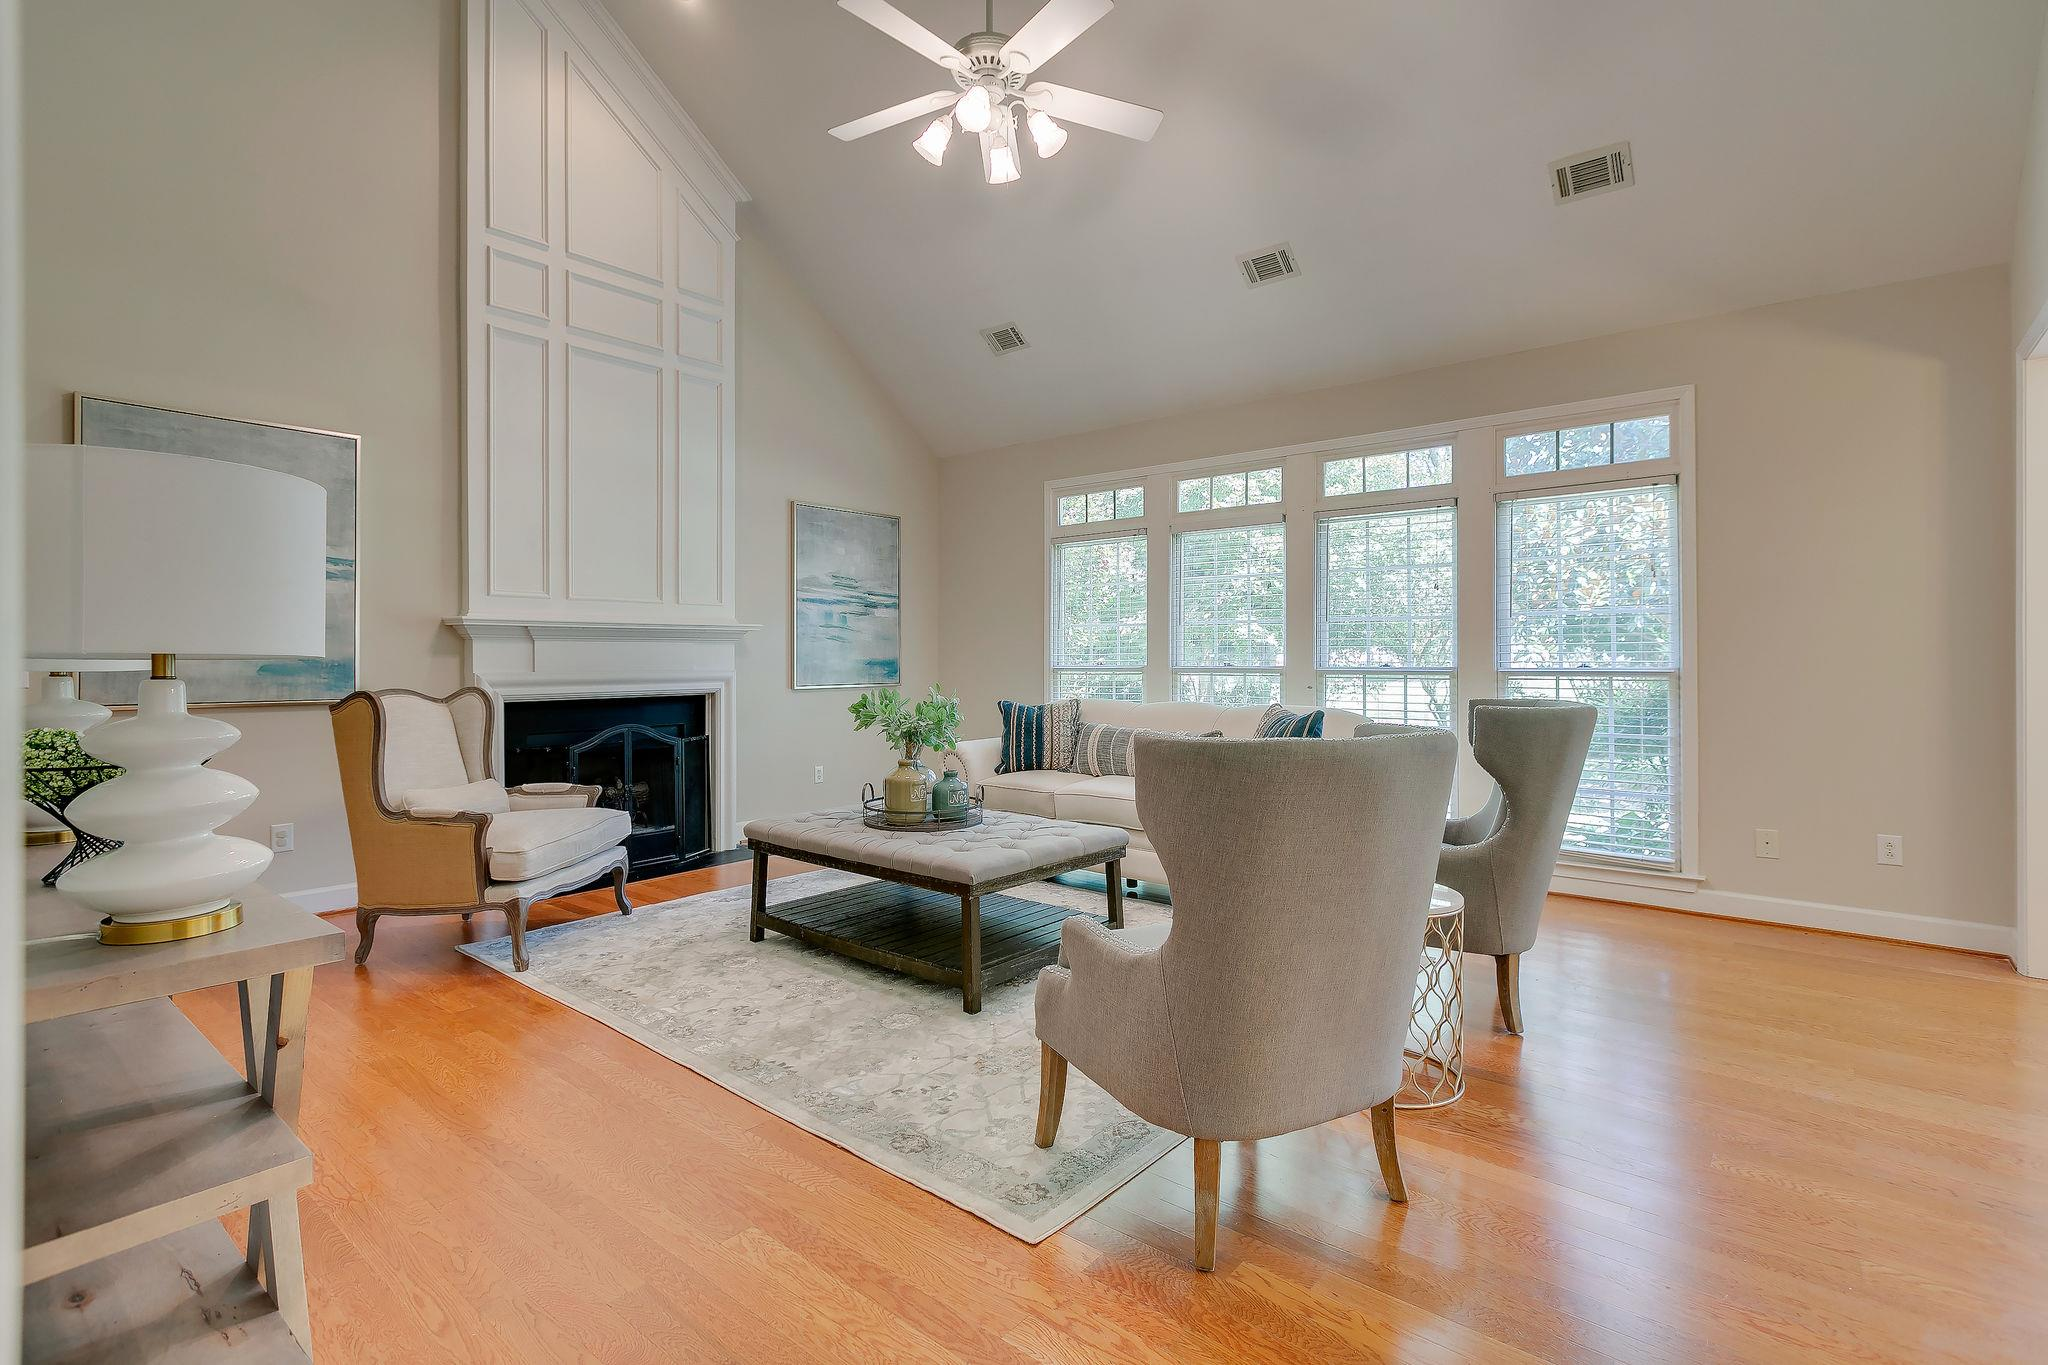 424 Crofton Park Ln, Franklin, TN 37069 - Franklin, TN real estate listing